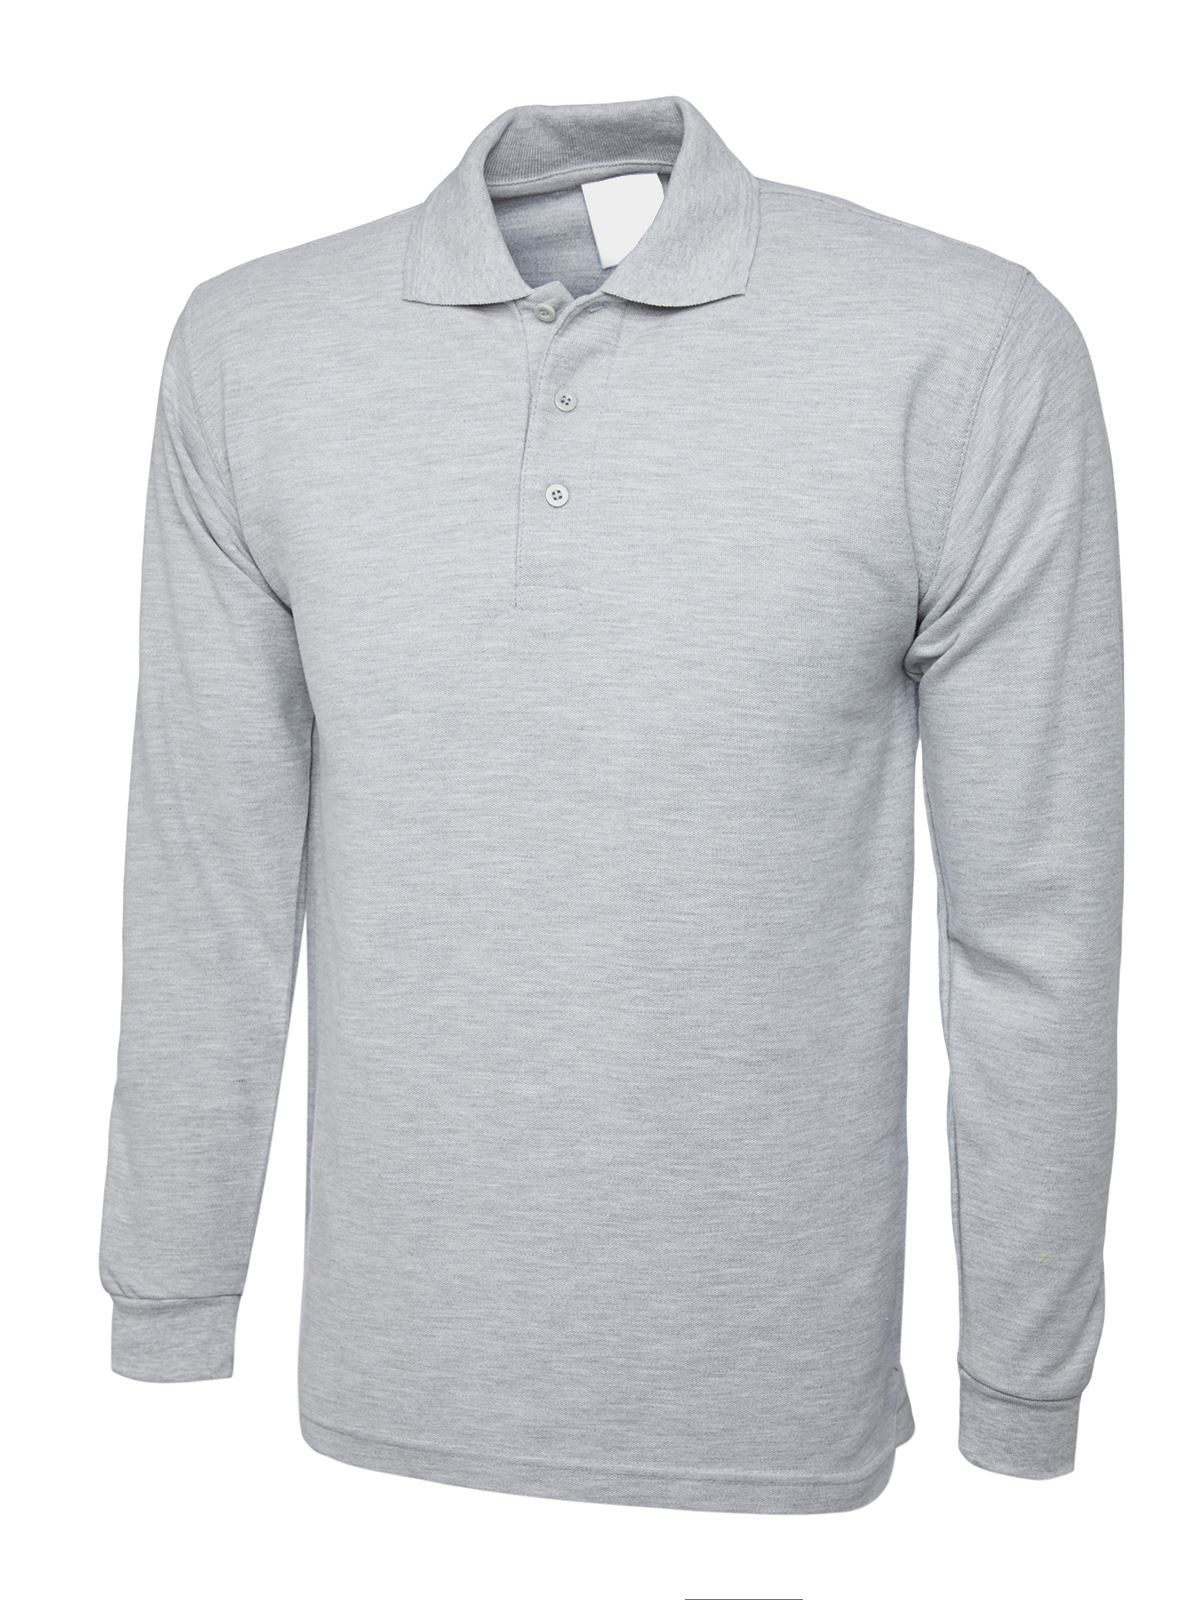 Mens Womens Long Sleeve Polo Shirt Plain Top Casual Work